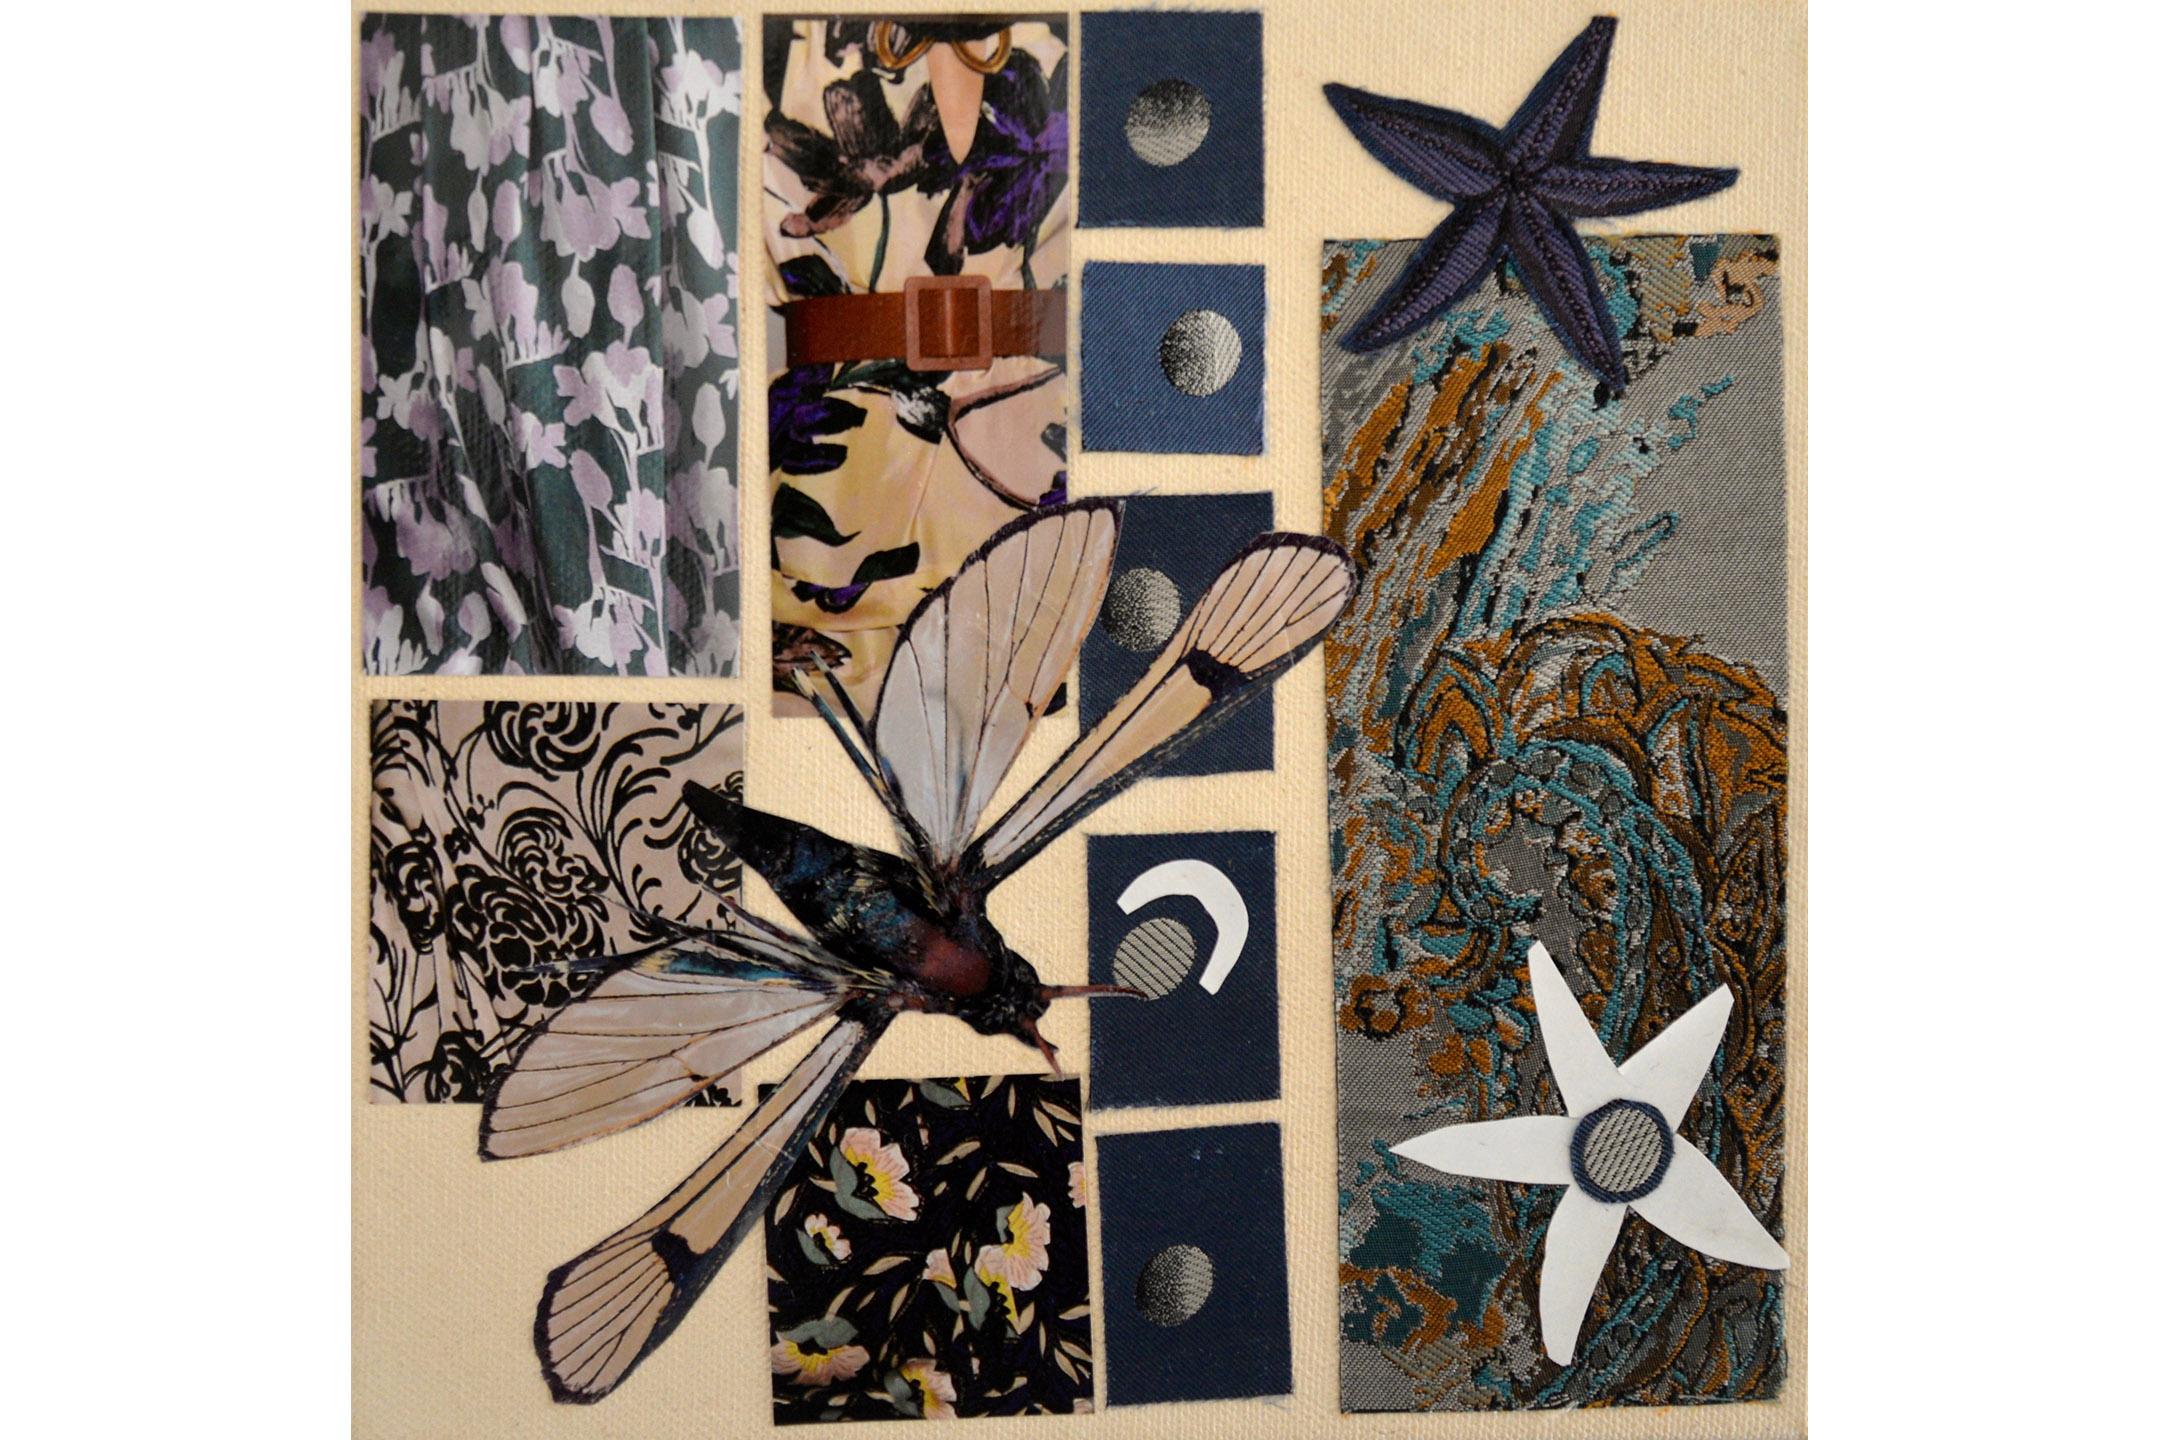 "Sara Petitt, Construction #2, Mixed media on canvas, 8"" x 8"", 2016"